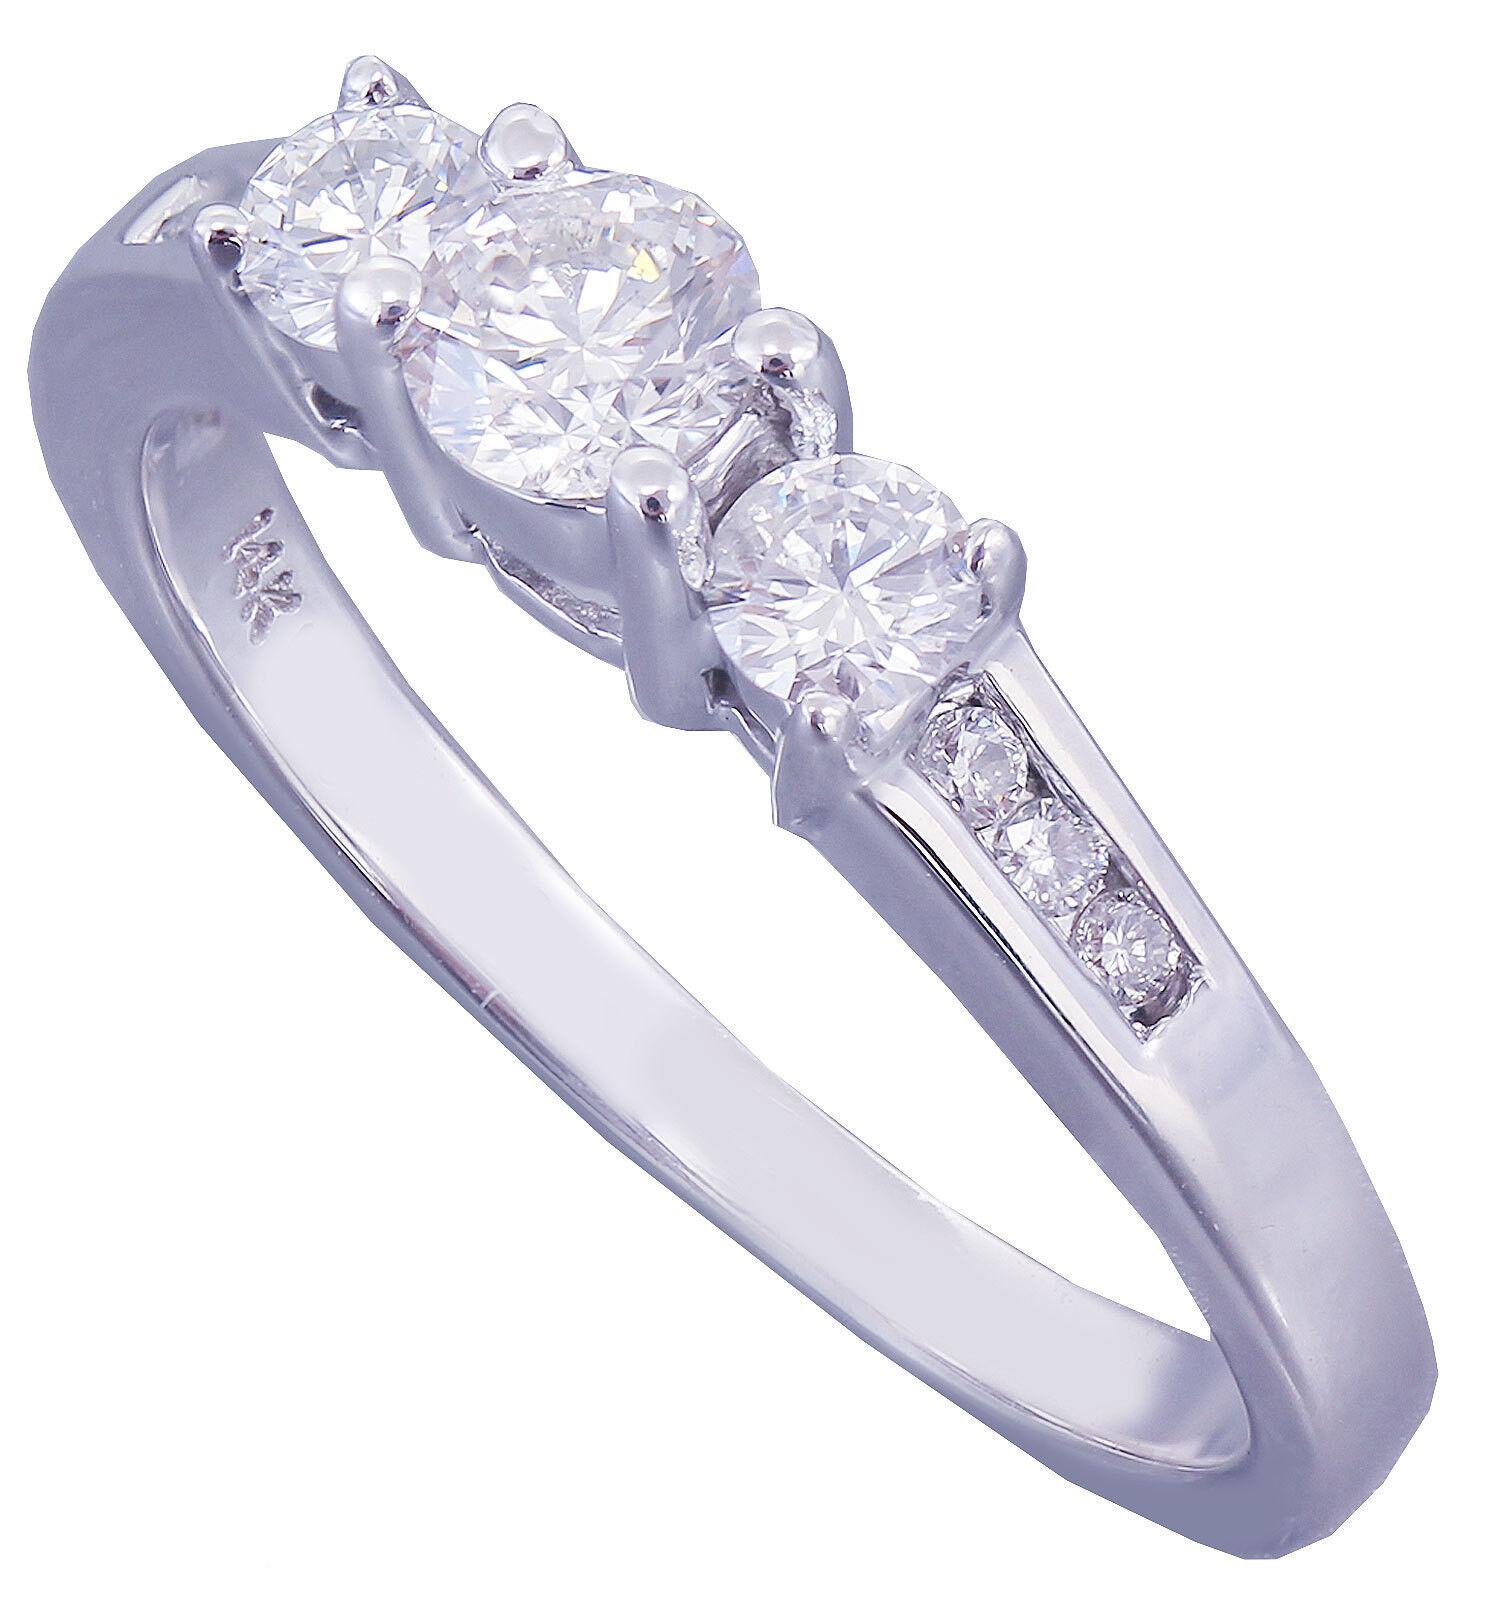 Eelegant 14k White gold Round Cut Diamond Engagement Ring Prong Bridal 0.42ct